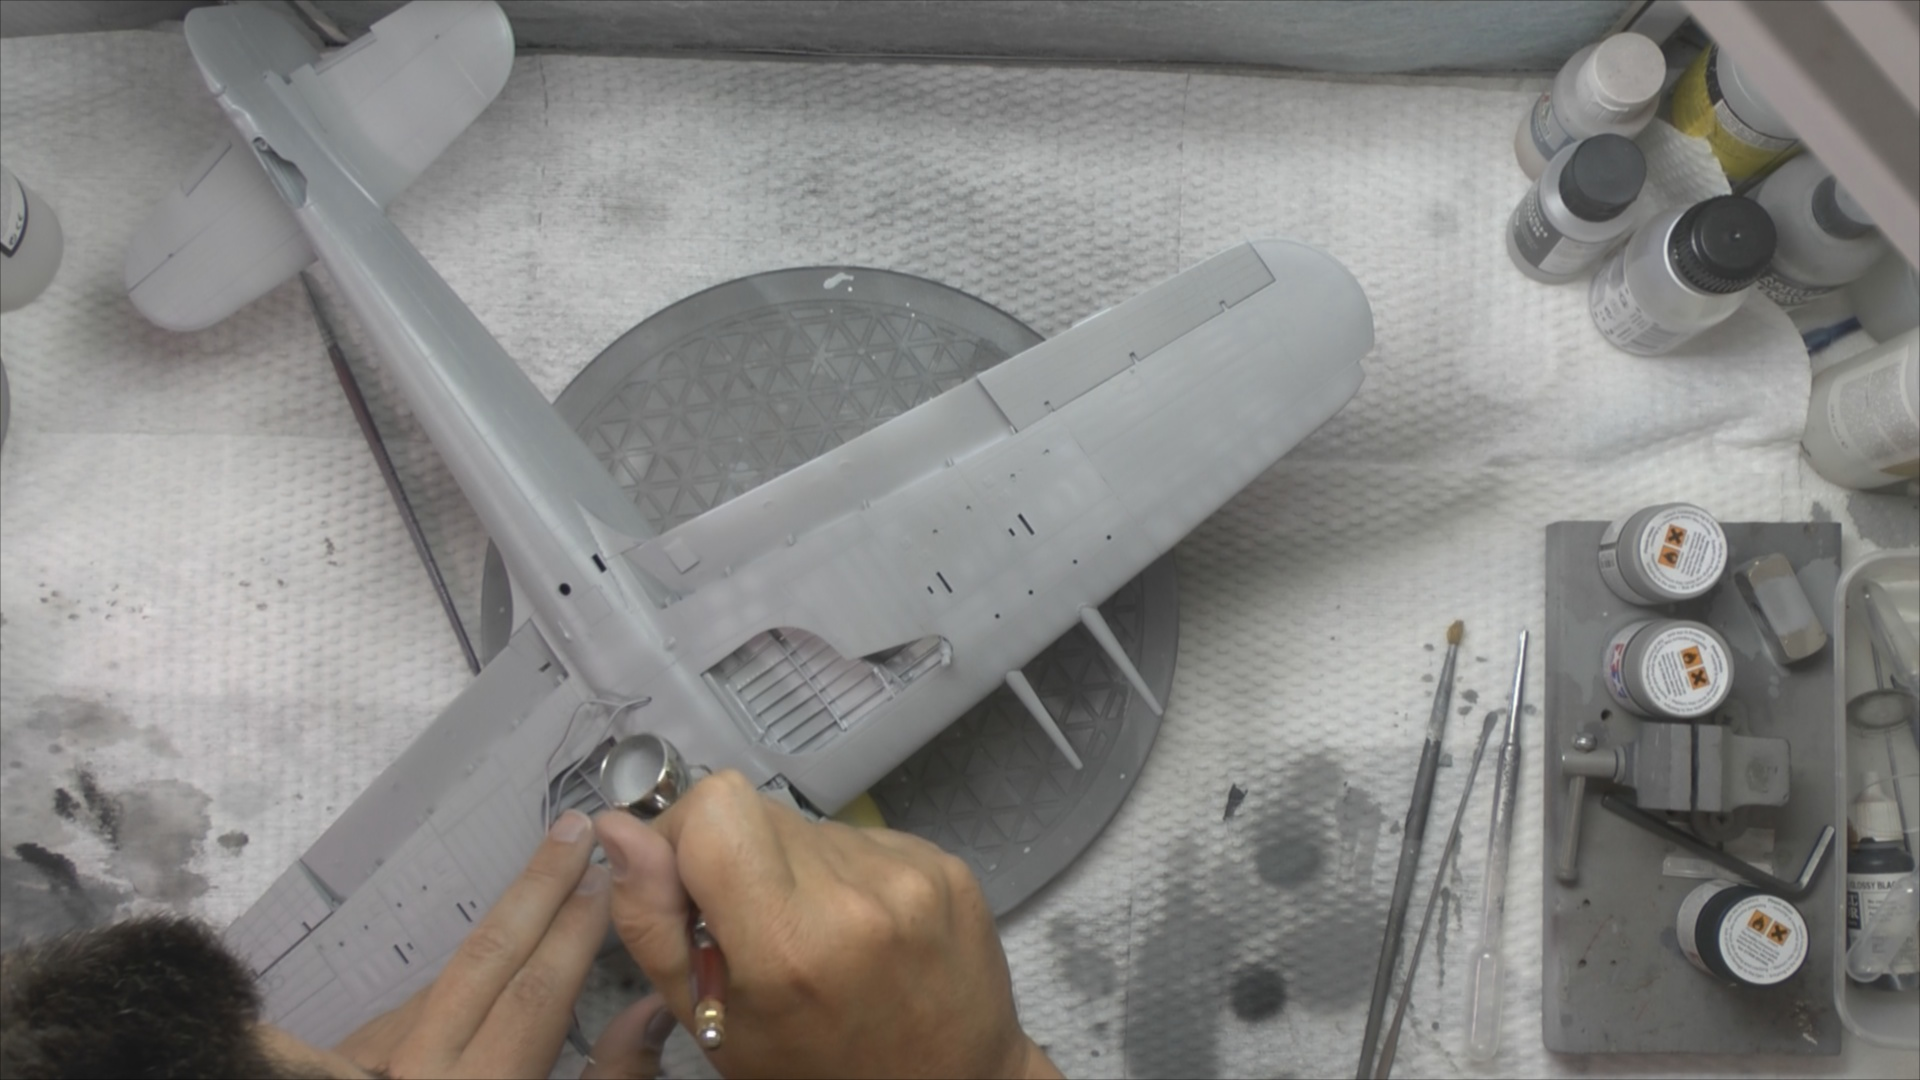 Hawker+Typhoon+Part+8+Pic+1.jpg